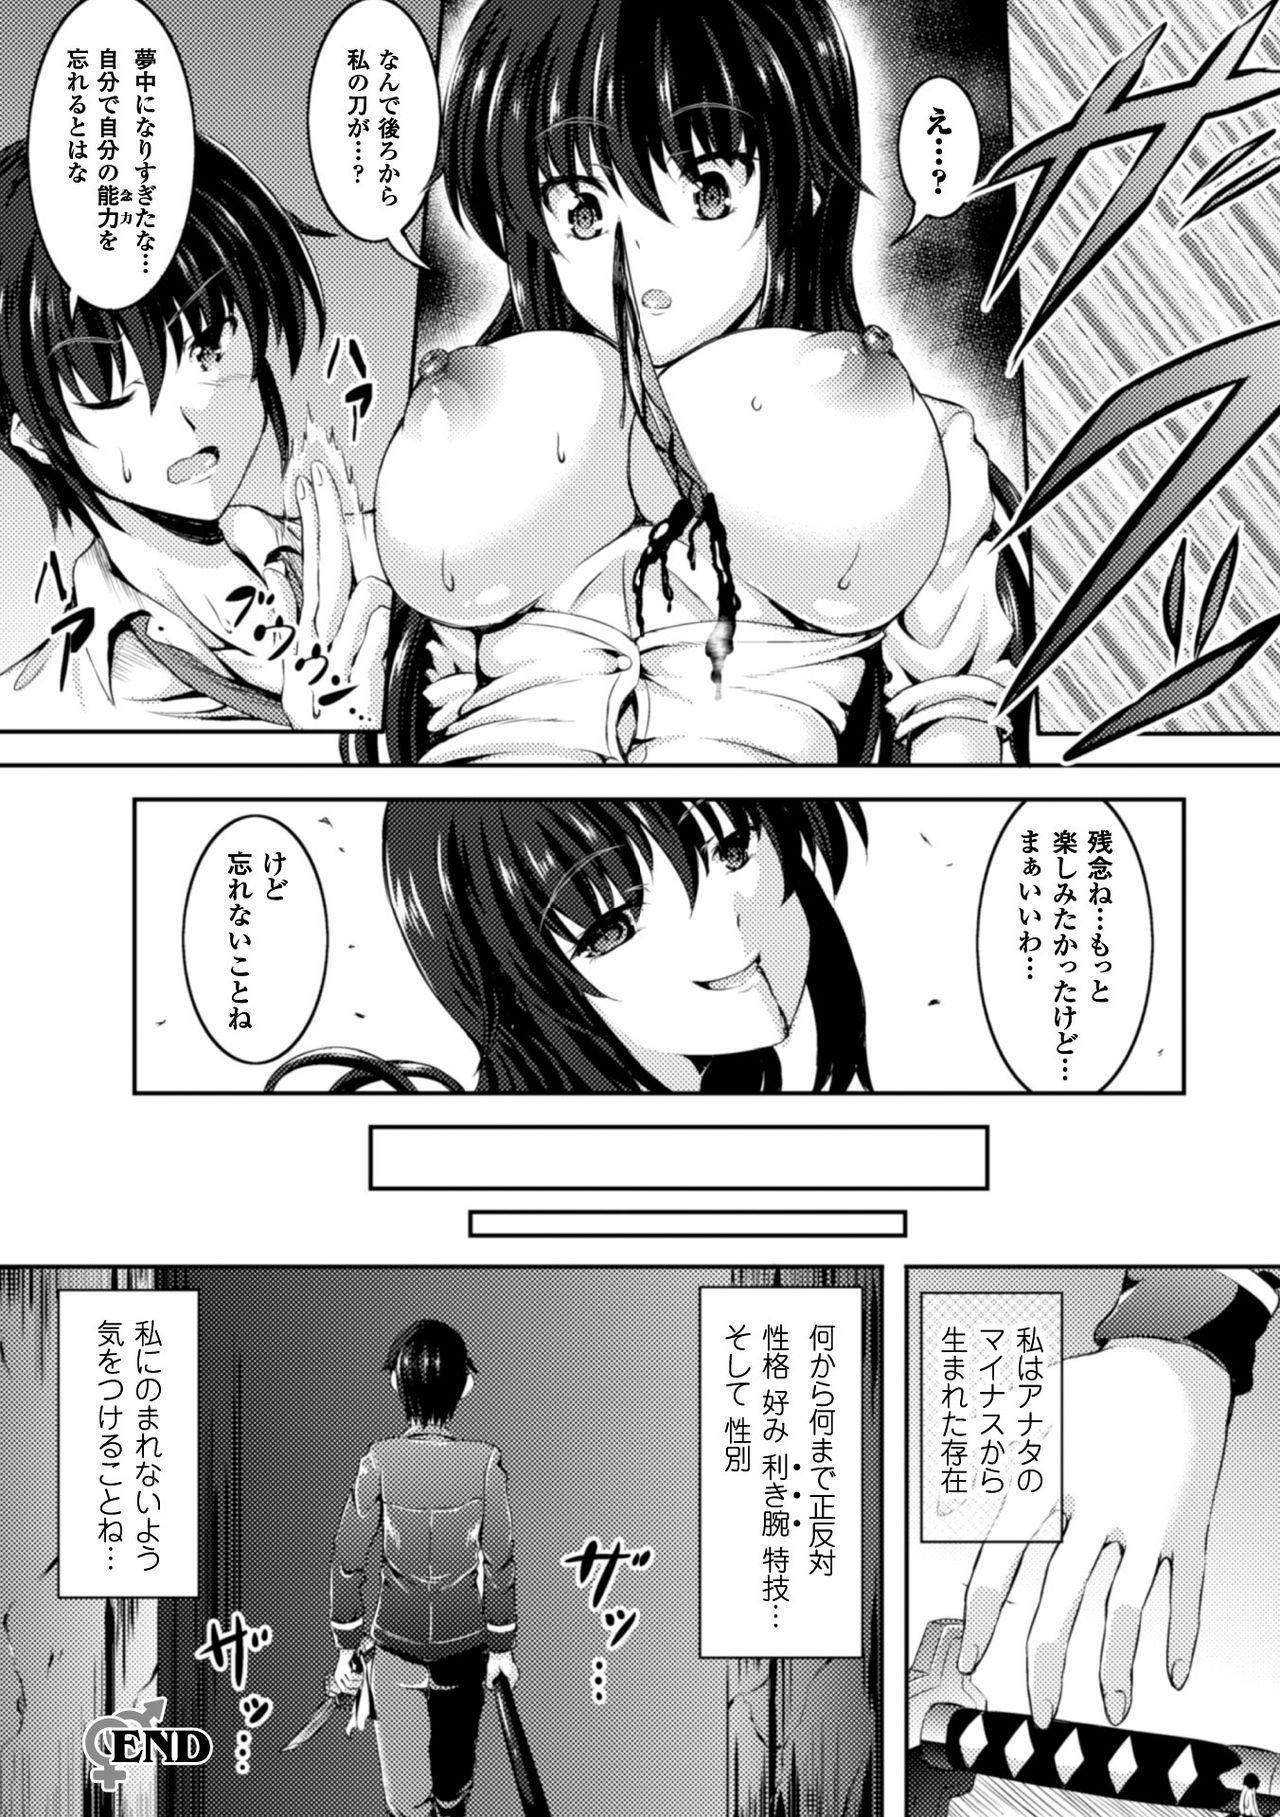 2D Comic Magazine TS Jibun Heroine mou Hitori no Ore ga Erosugite Gaman Dekinee! Vol. 1 21